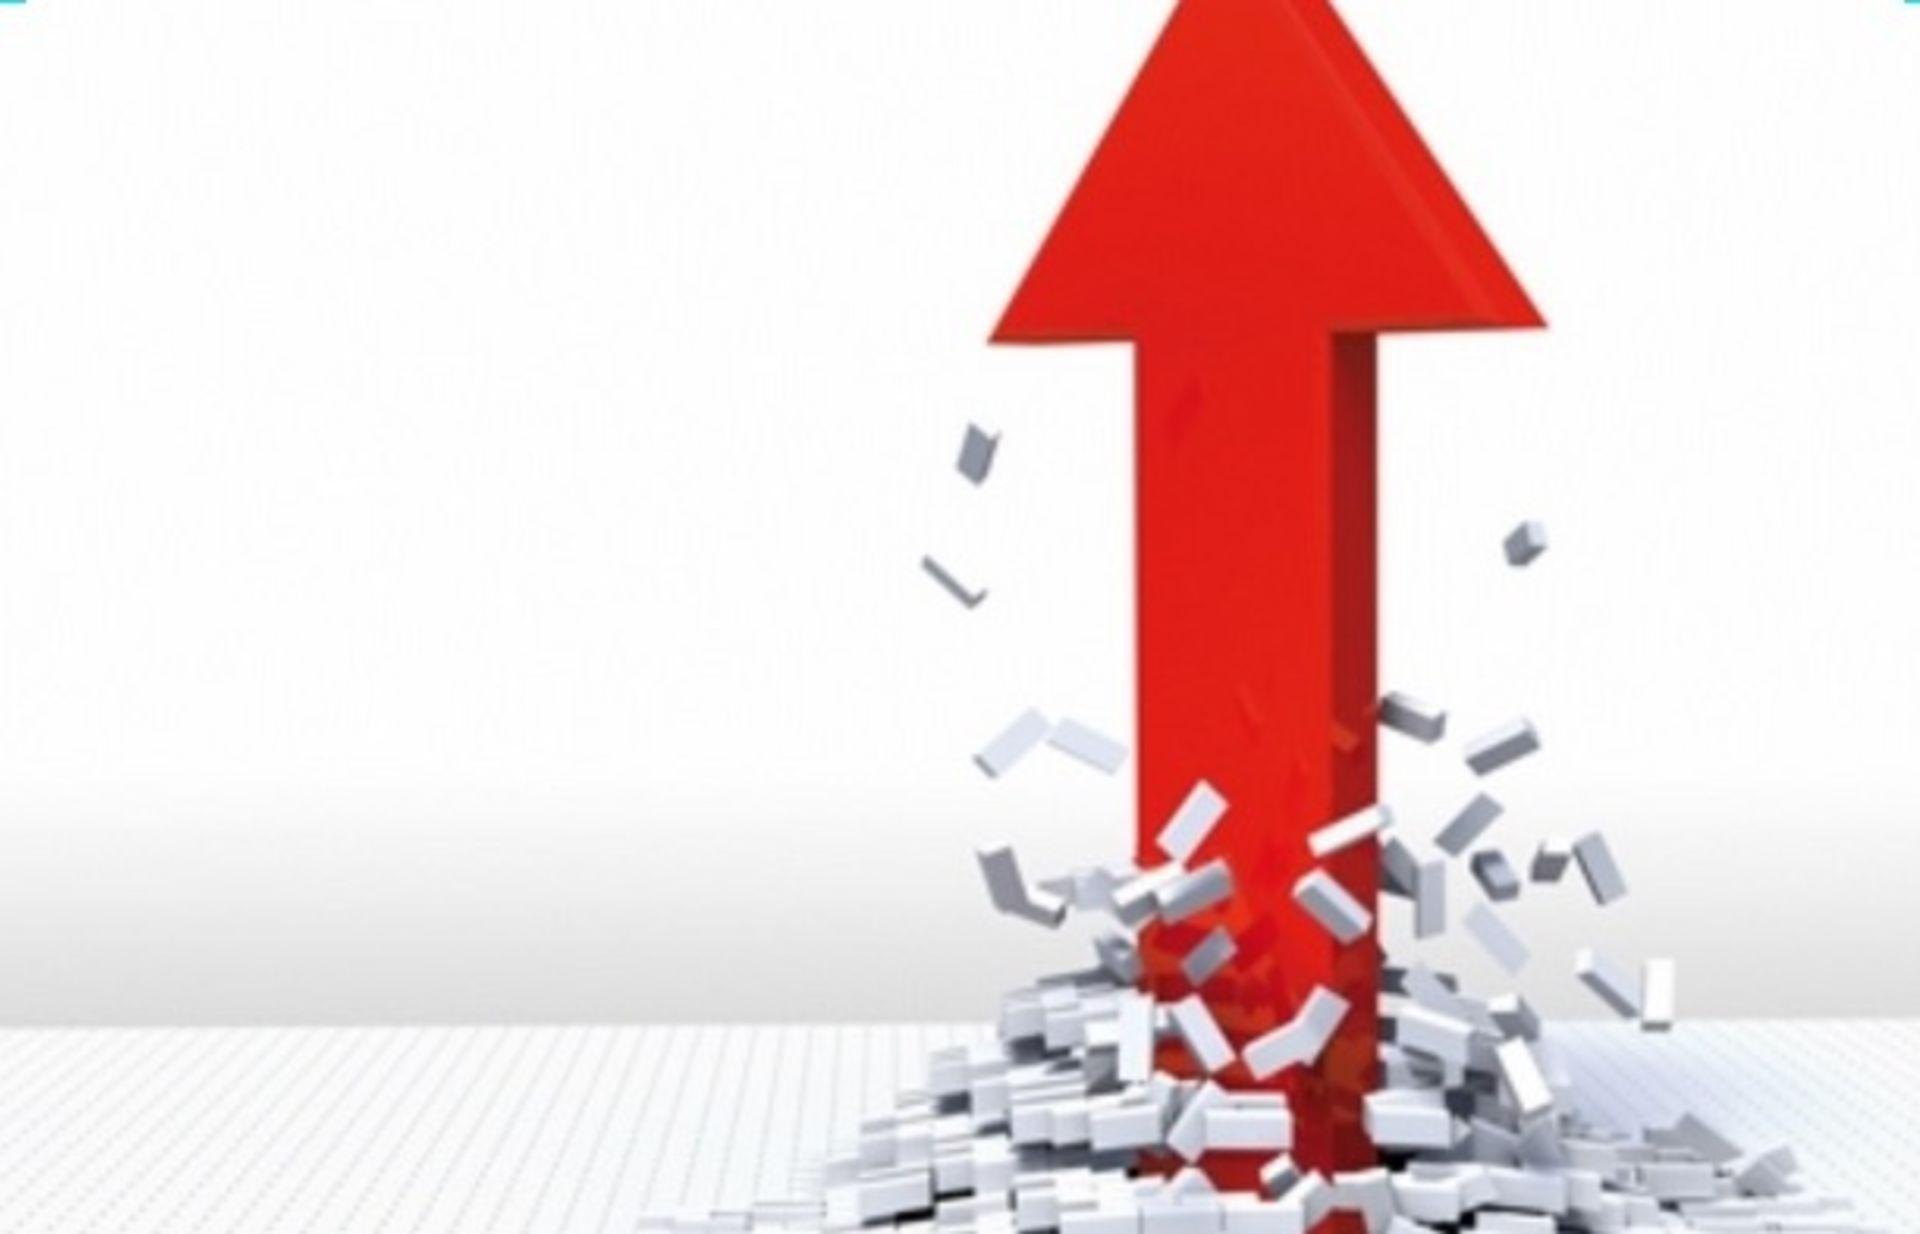 How to Judge the Impact of the Next Economic Slowdown on Housing